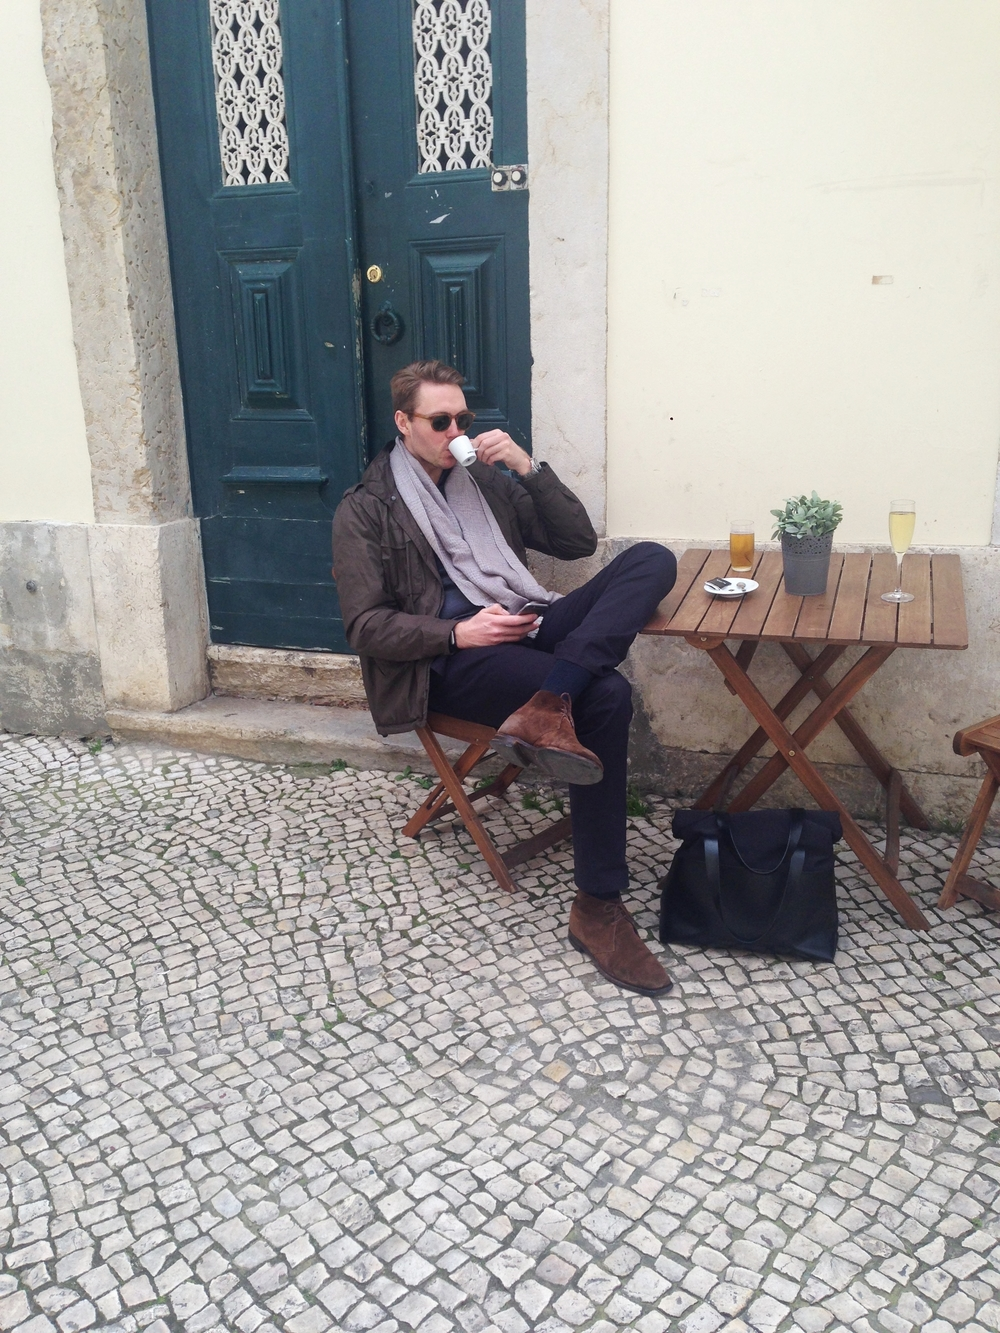 AO PE DA SE Lisbon hellogetaway cityguide